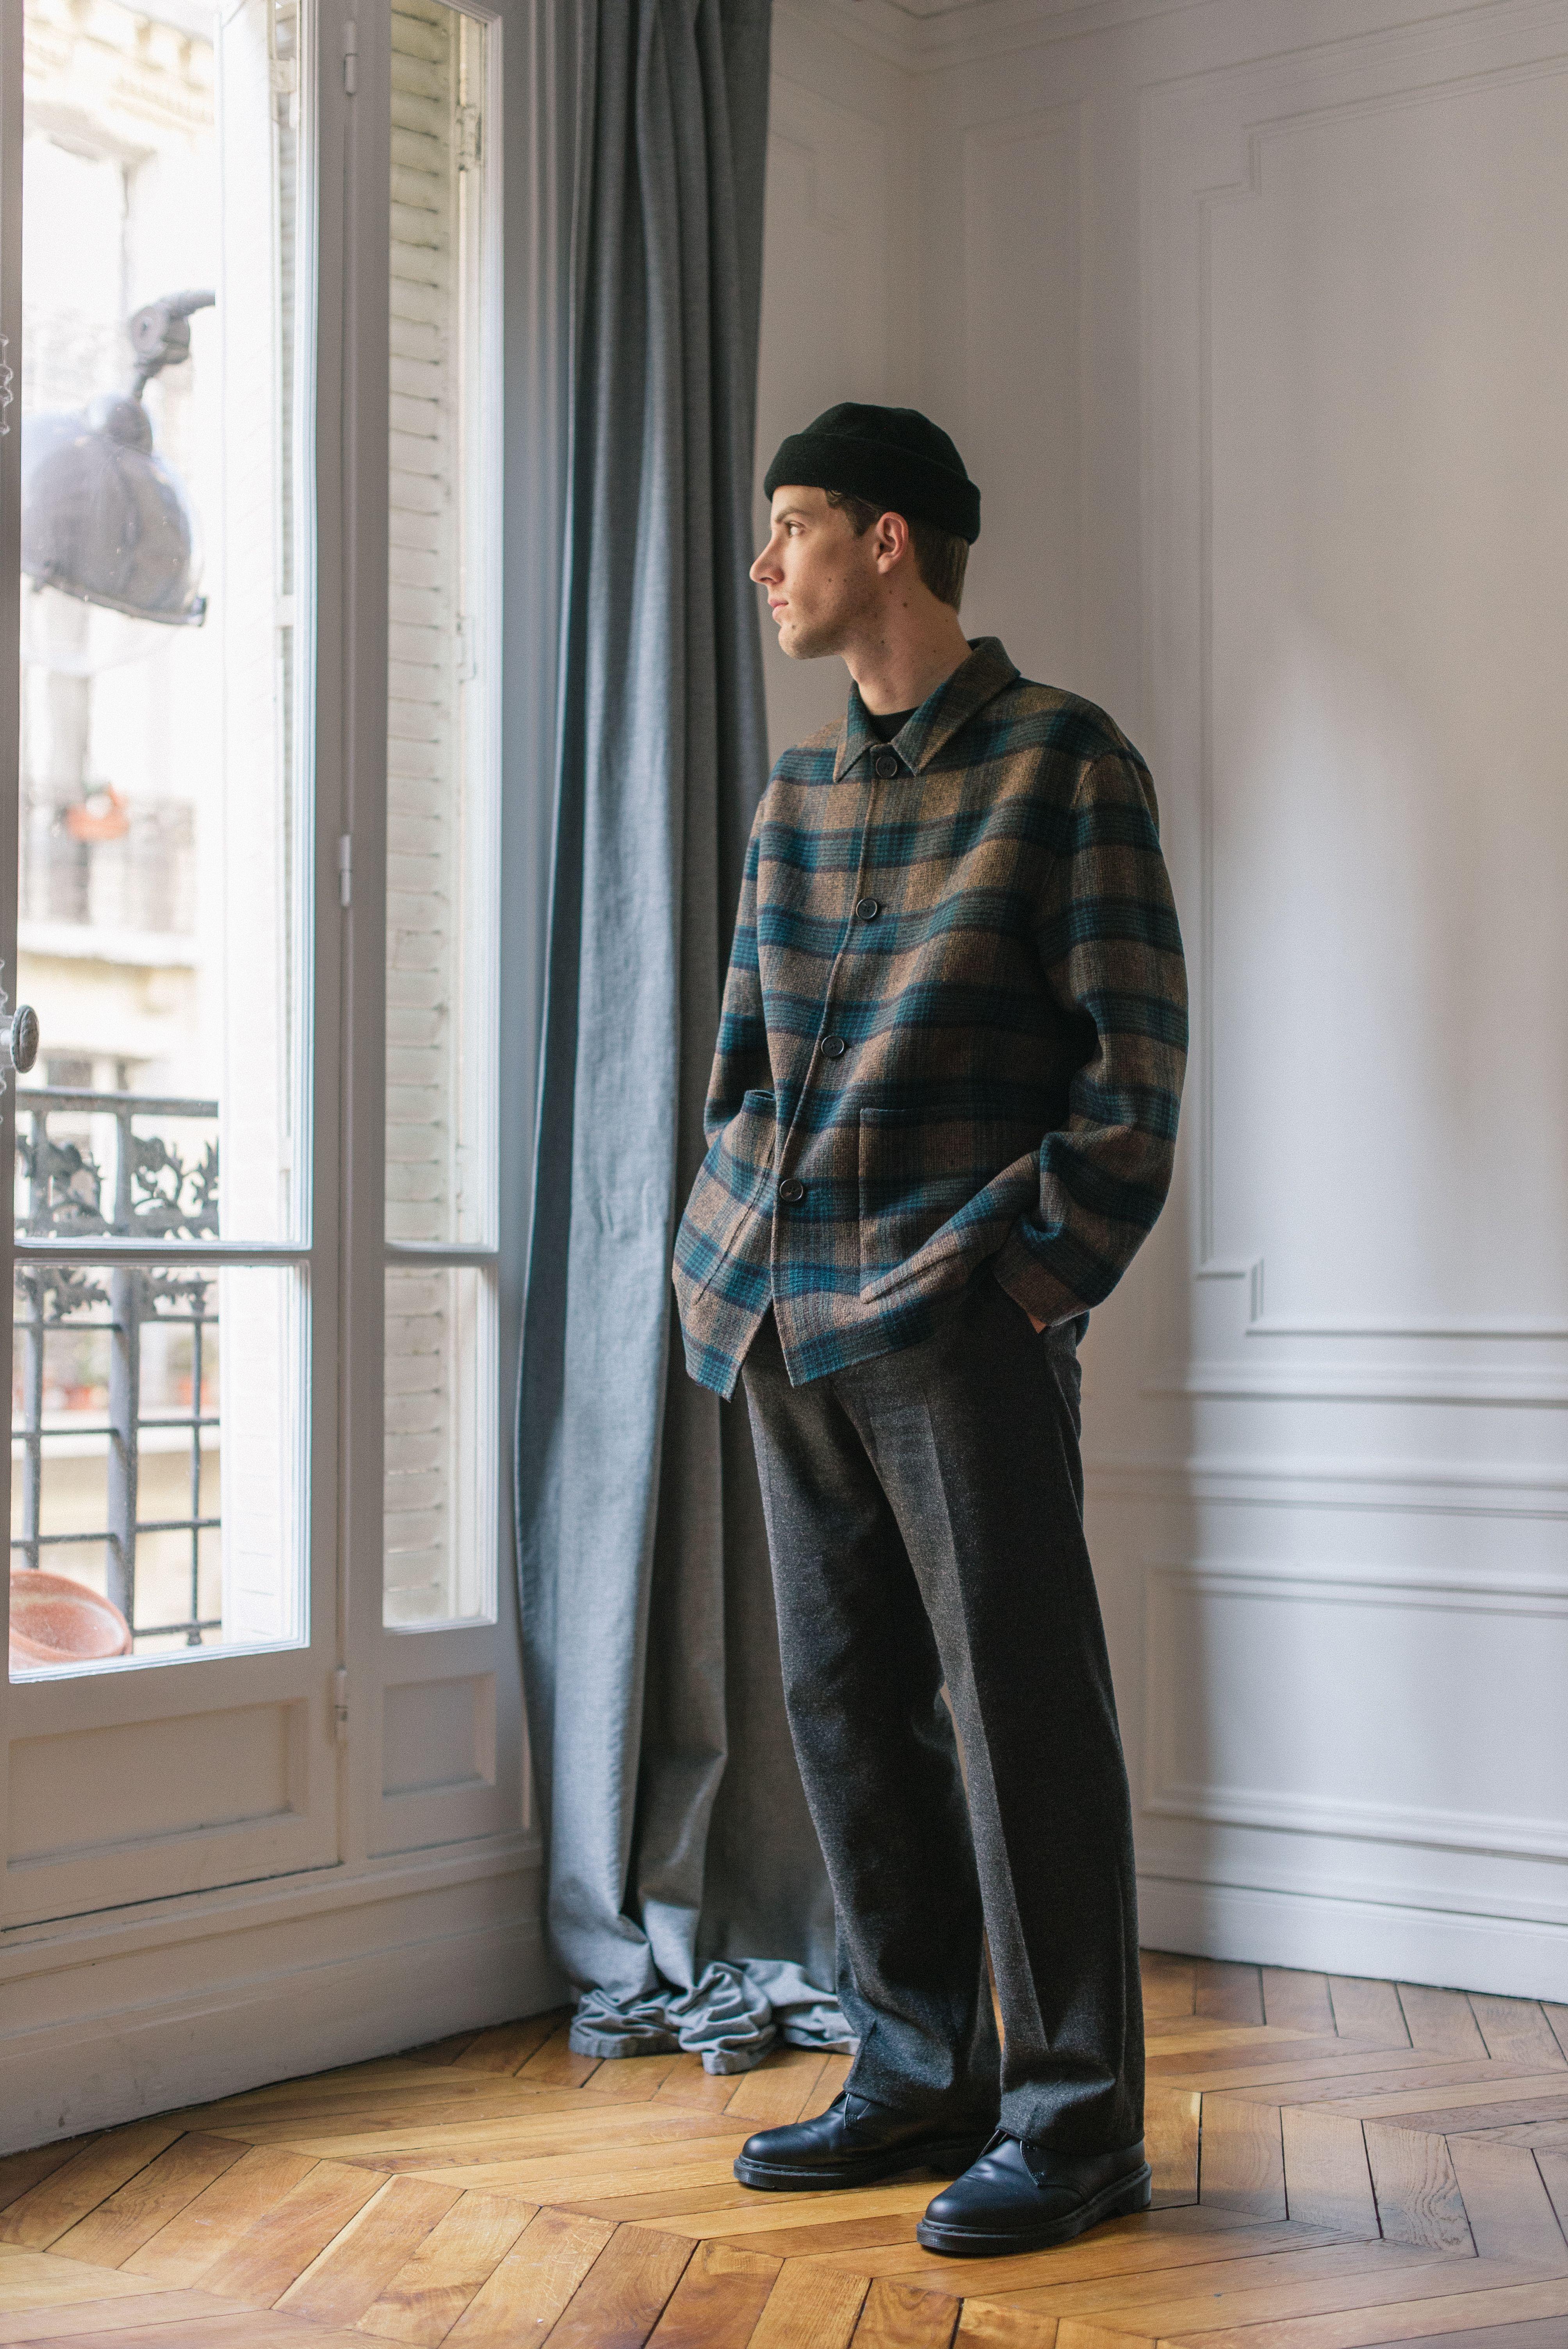 Pin by Jeroen Vermunt on Clothing 2|true warm autumn in 2020